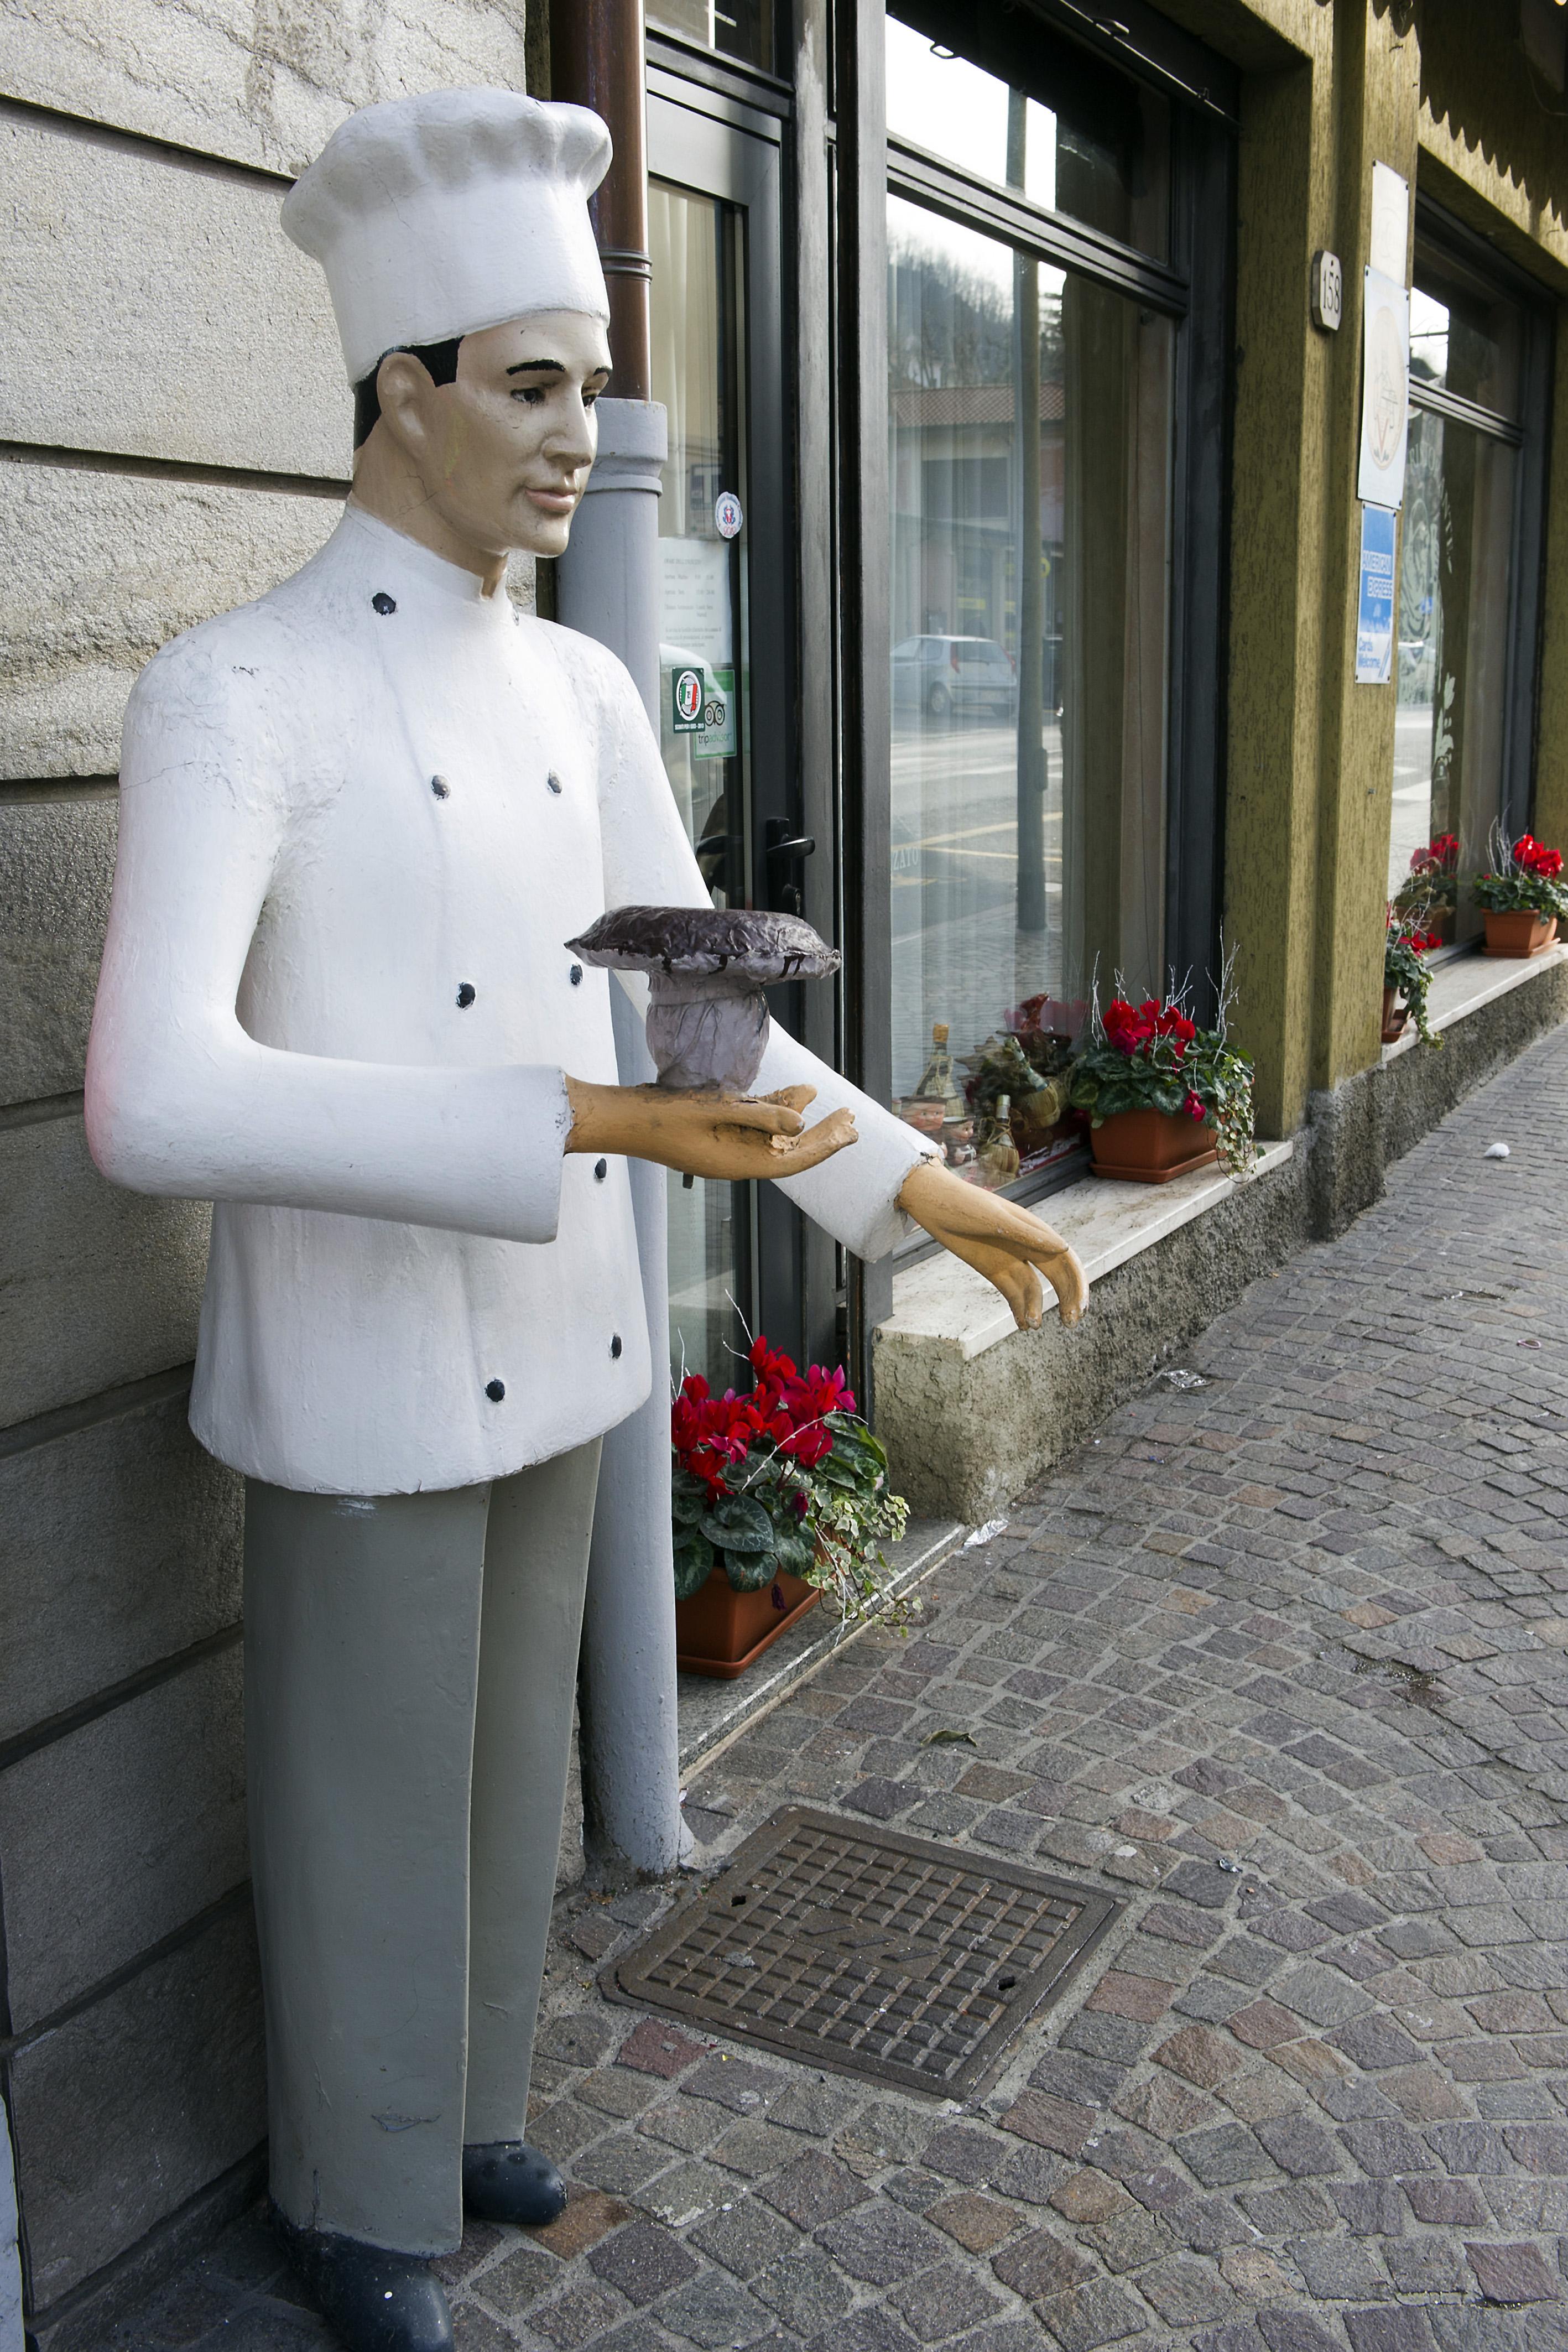 V_ristorante_frate_monteolimpino_1